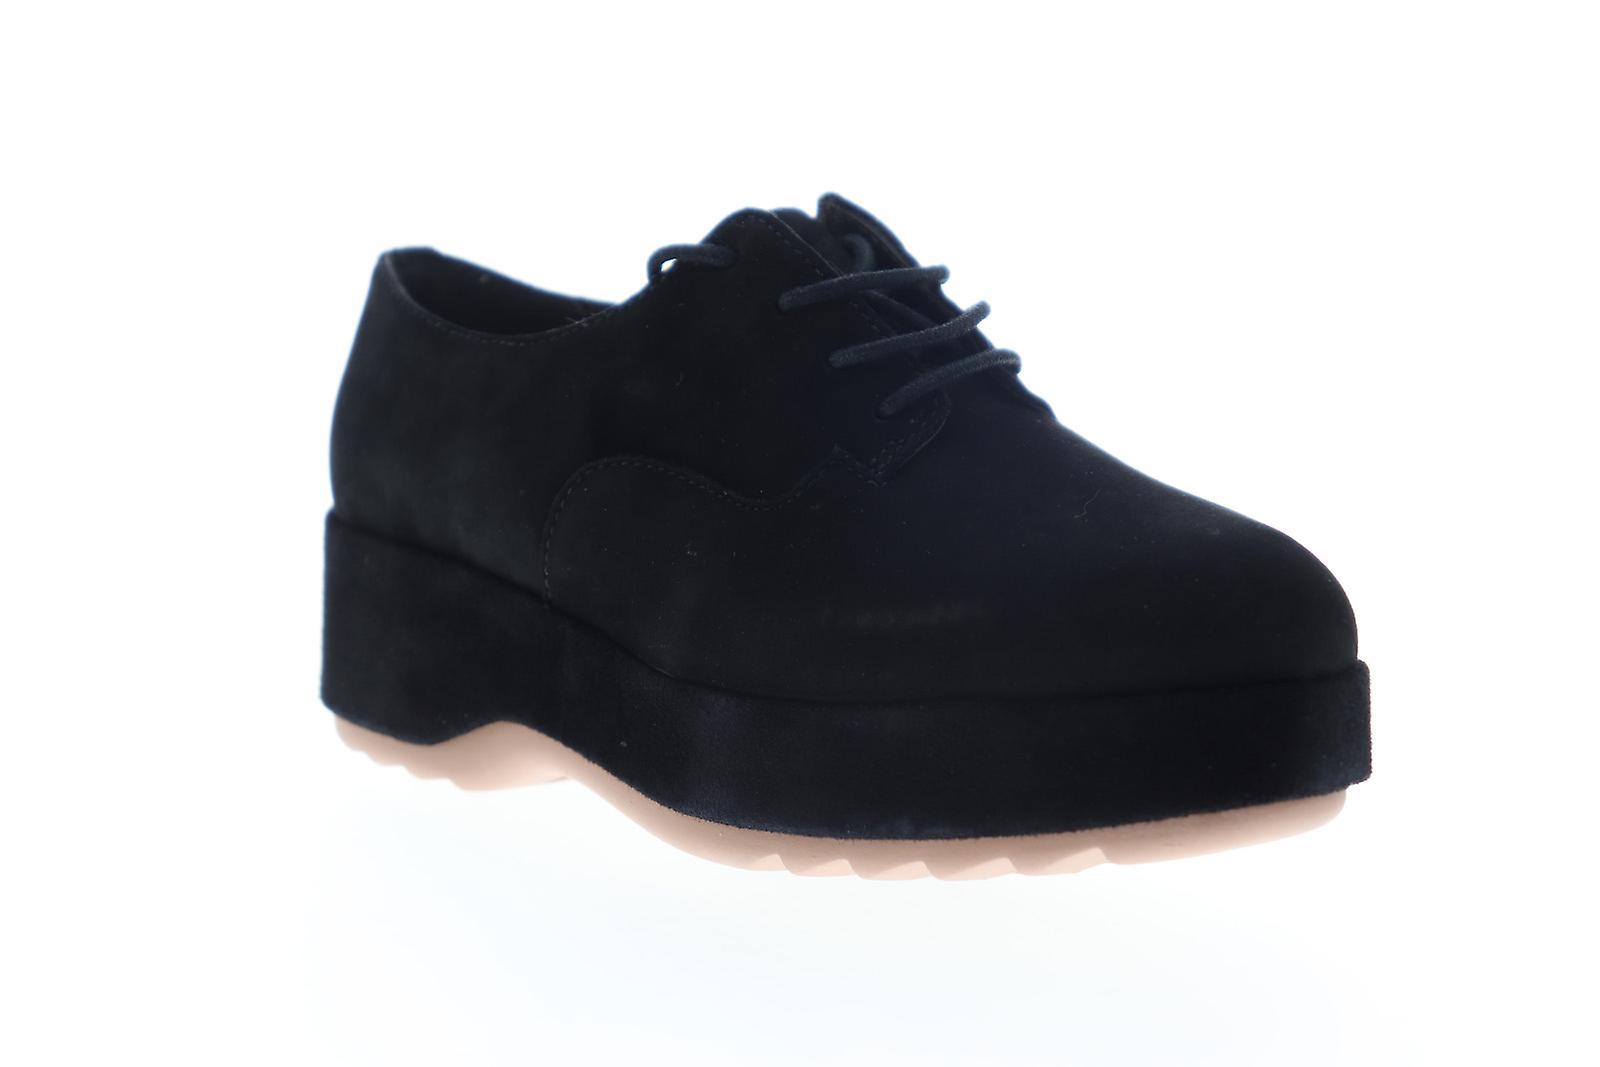 Camper Dessa Womens Black Nubuck Leather Lace Up Oxford Flats Buty L0TII